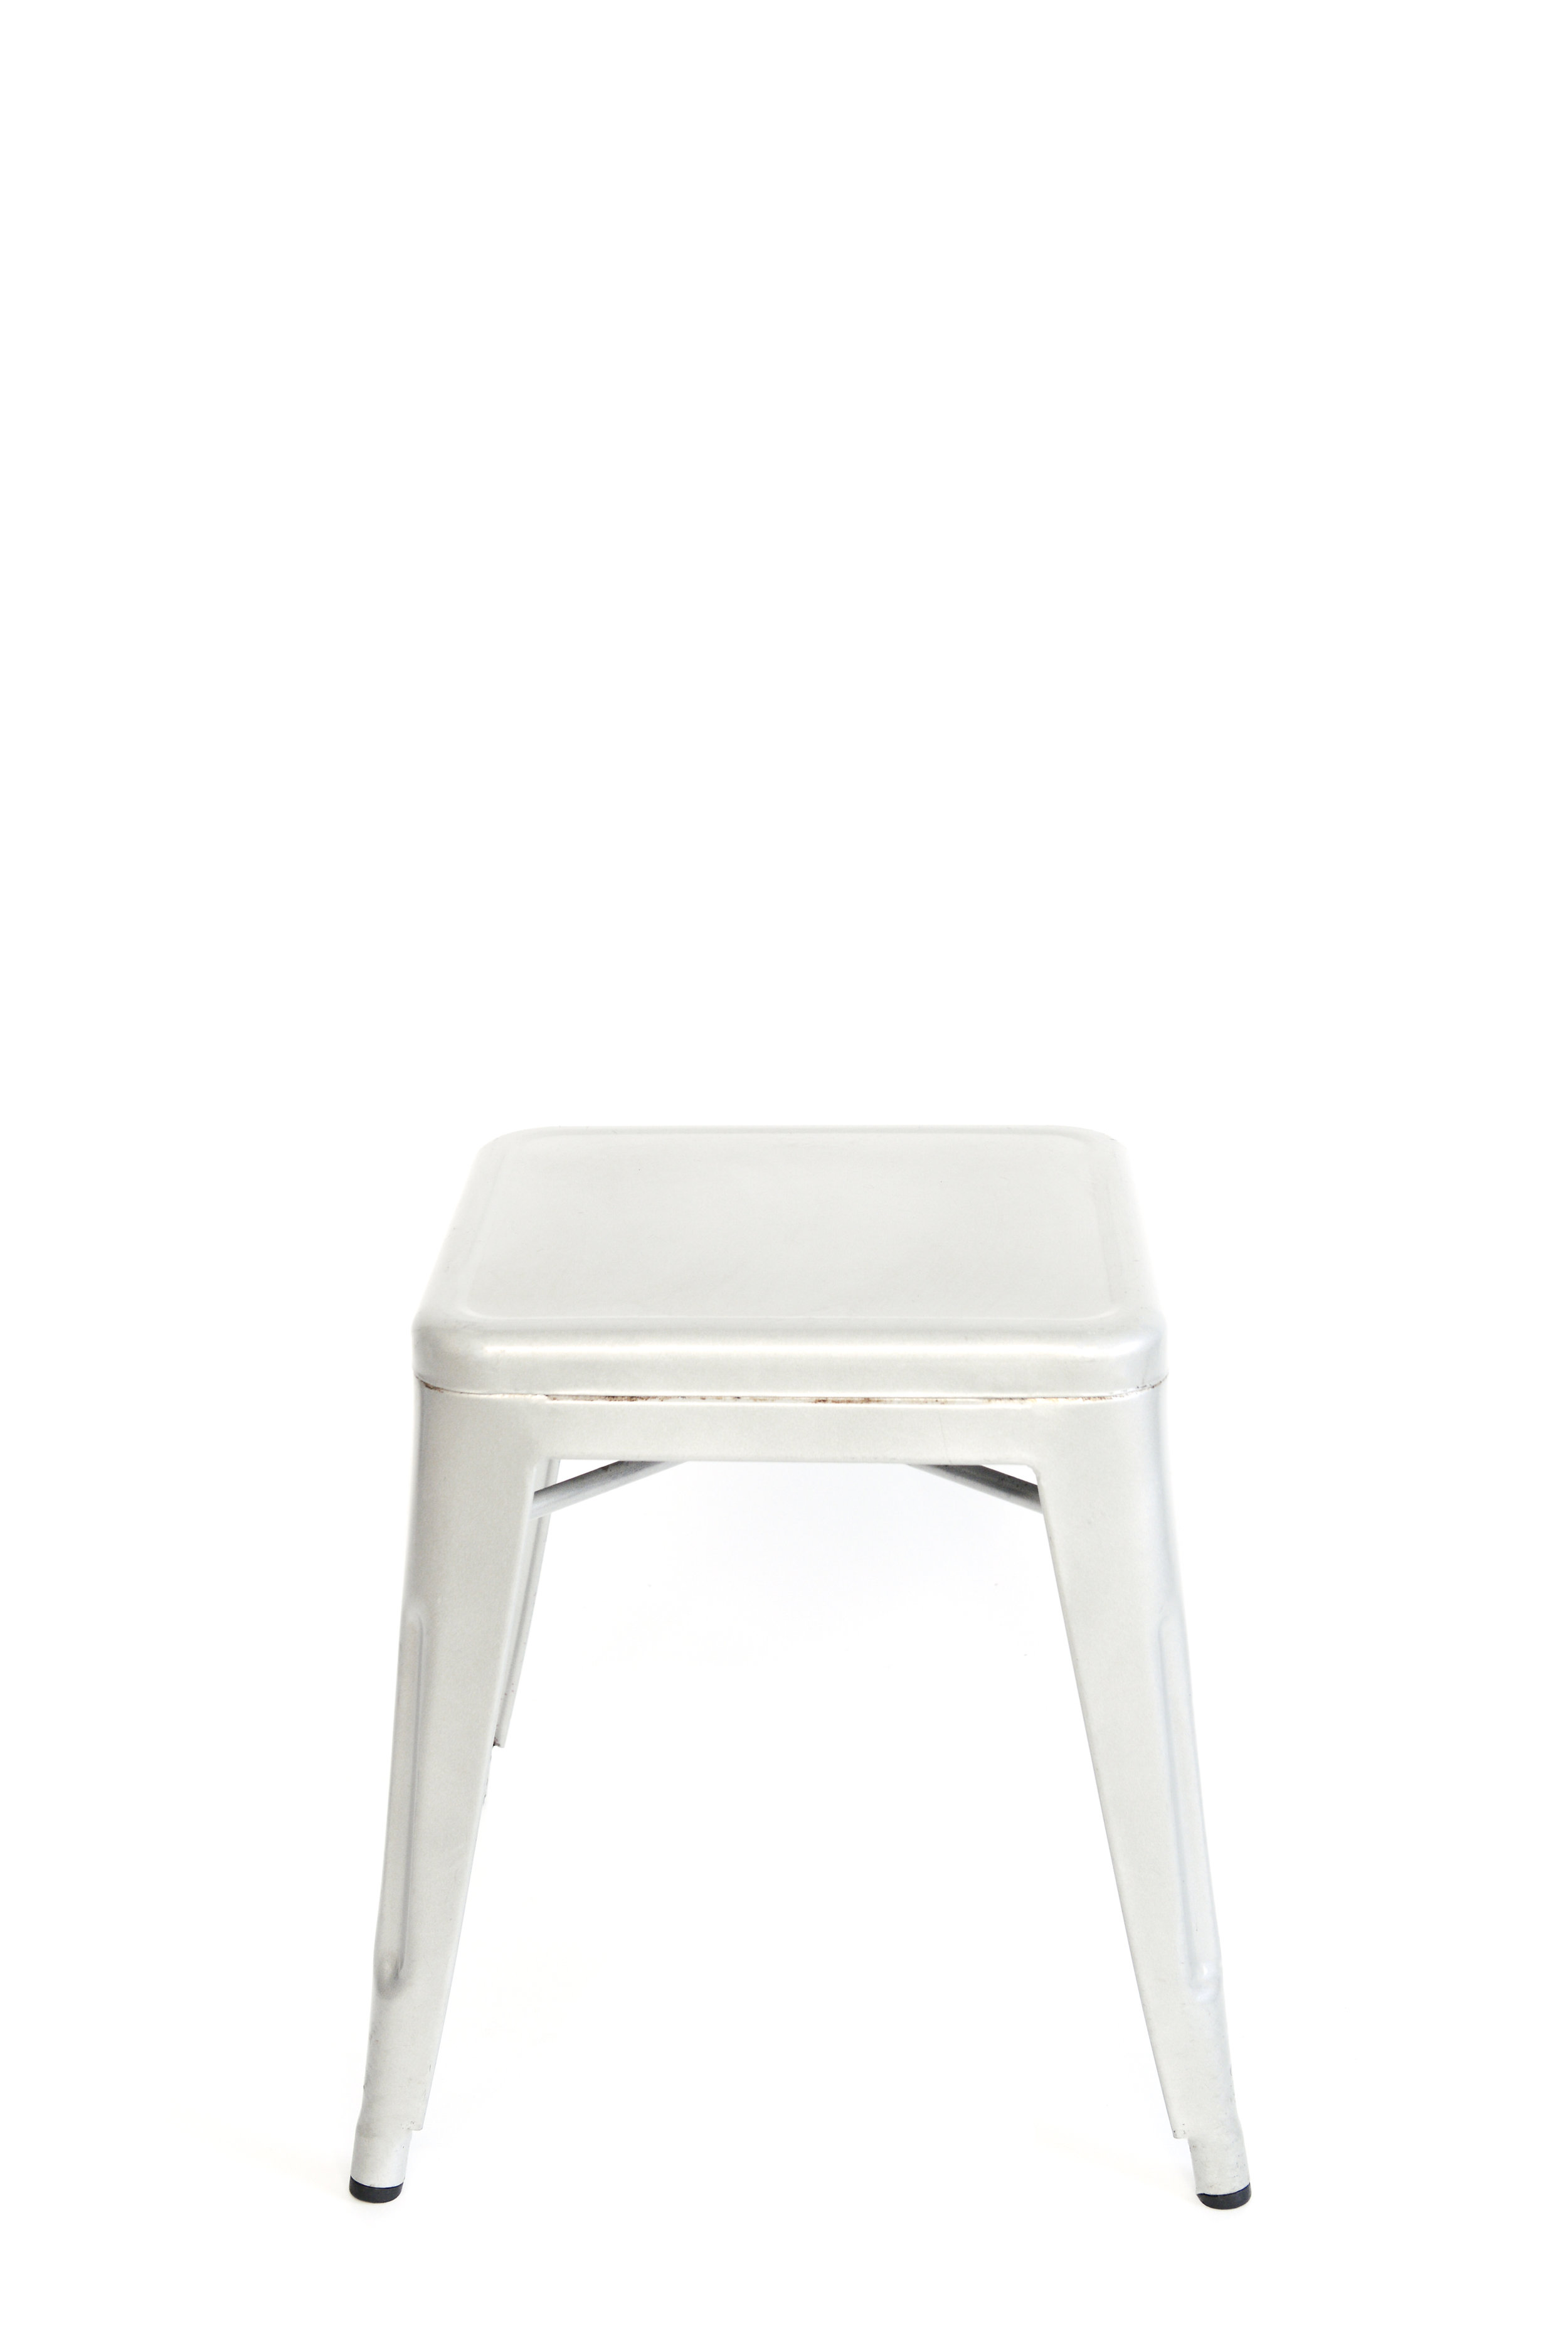 holocene_furniture-9.jpg